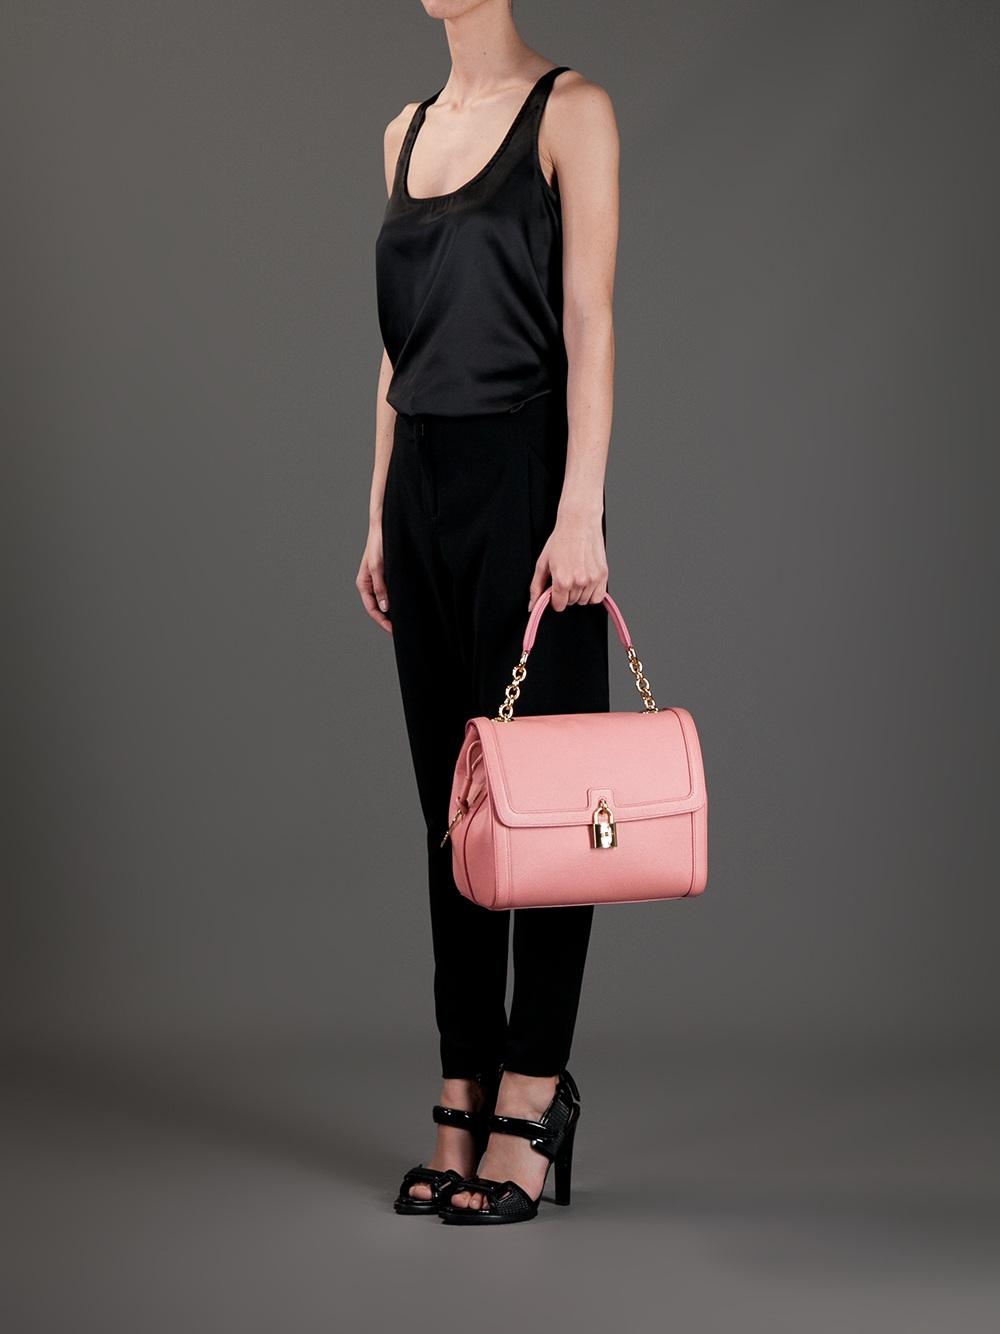 Dolce & Gabbana Padlock Tote in Pink